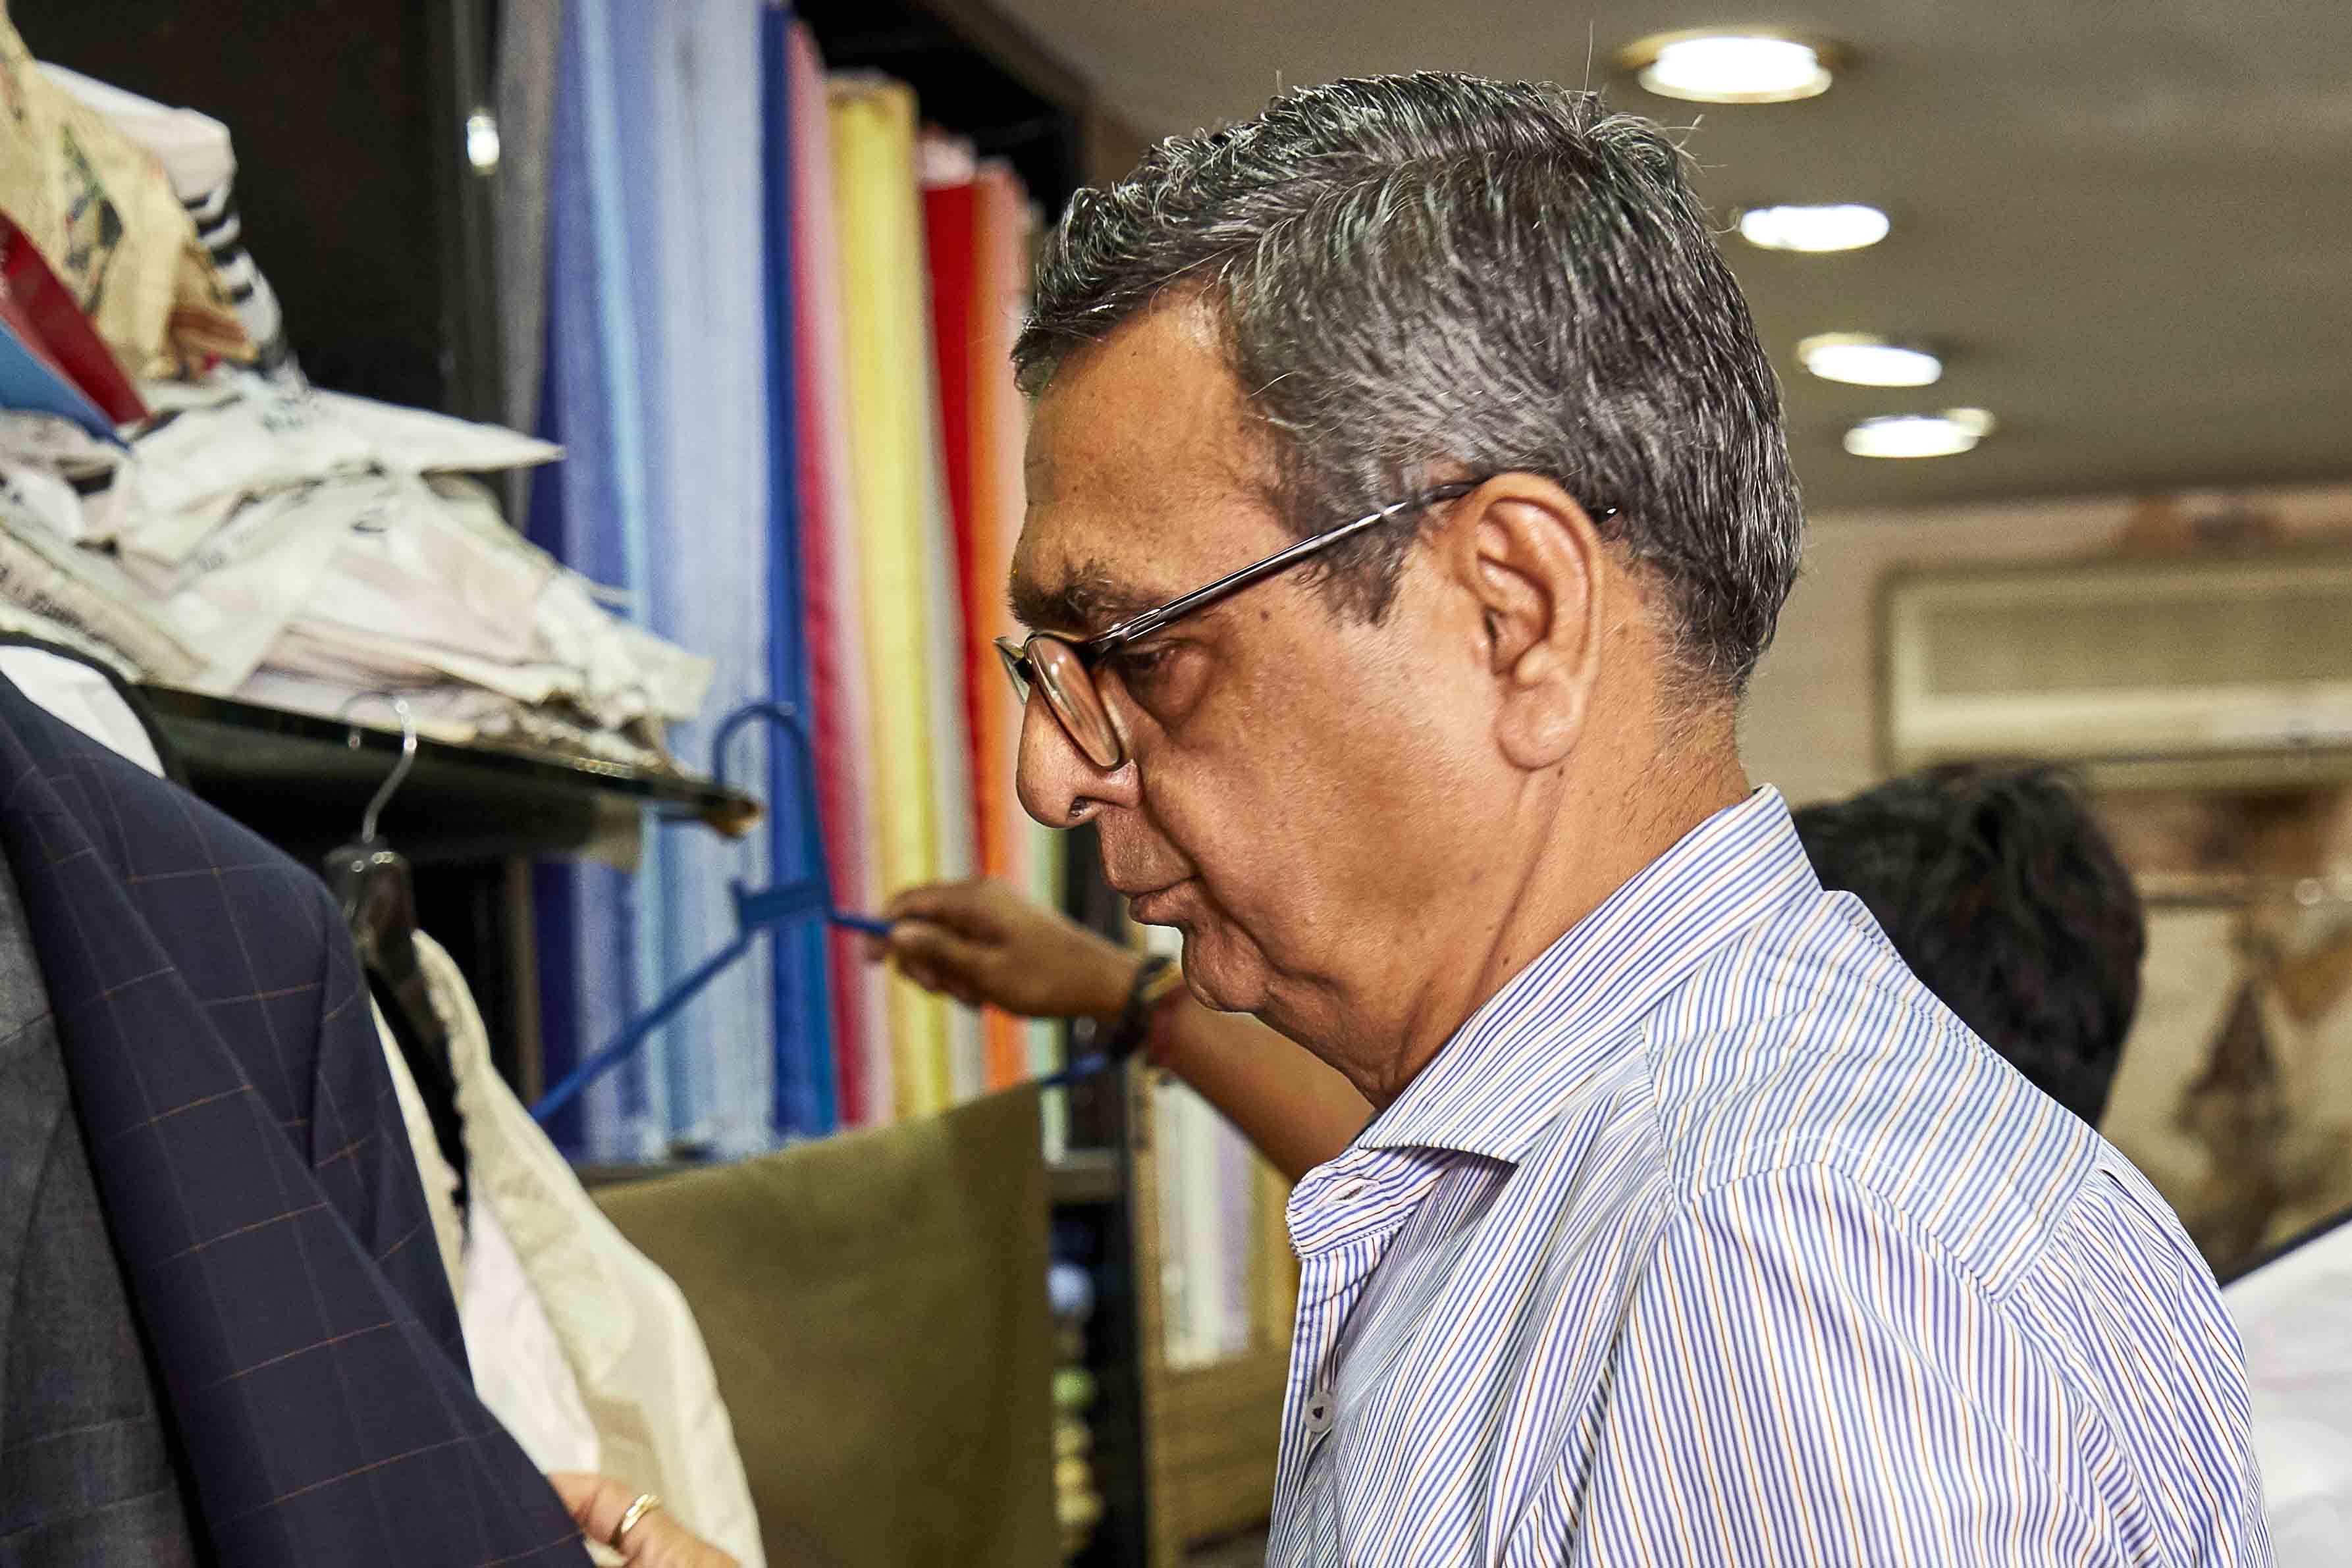 Custom-made garments, Fashion, Featured, Michele Boutique, Mukesh Pahuja